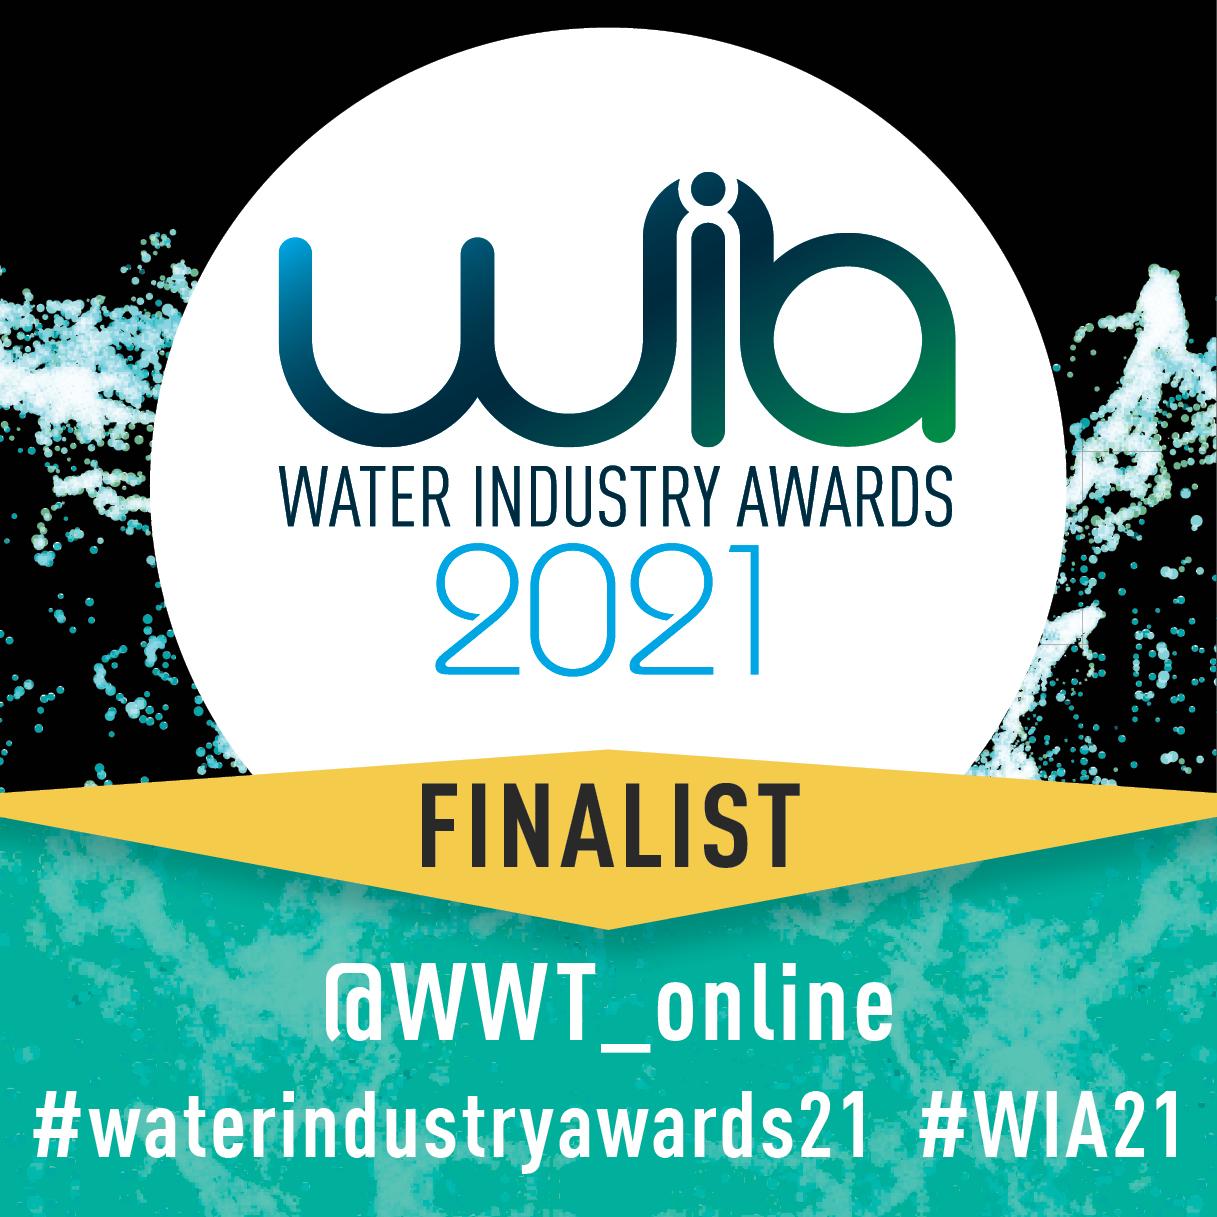 WIA21-finalistlogo-generic-300